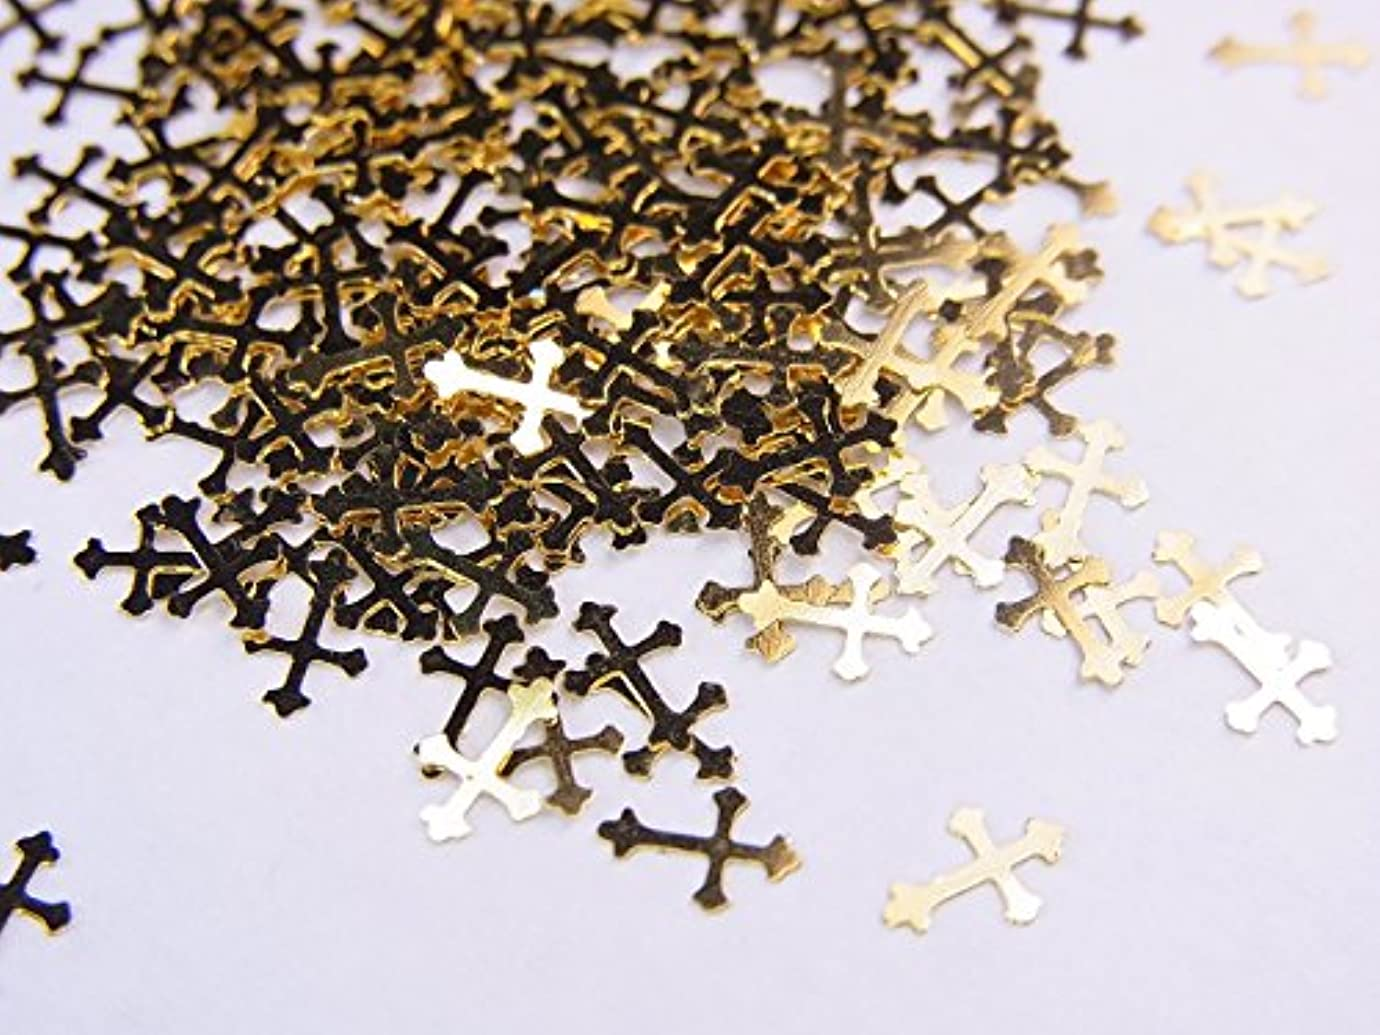 【jewel】薄型ネイルパーツ ゴールド クロス十字架10個